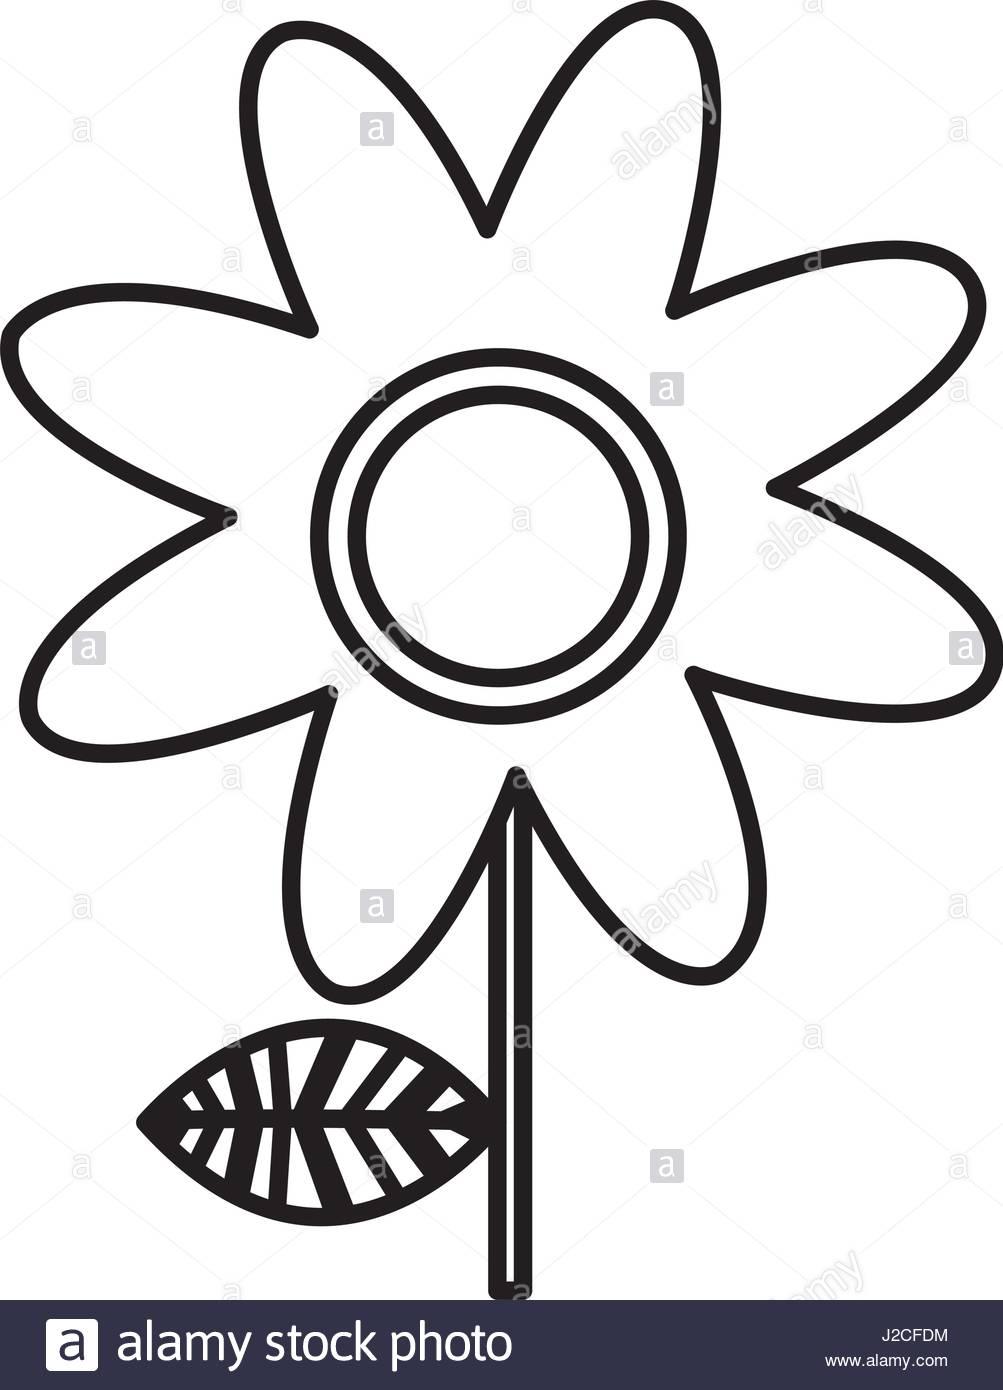 1003x1390 Monochrome Silhouette Of Daisy Flower Stock Vector Art